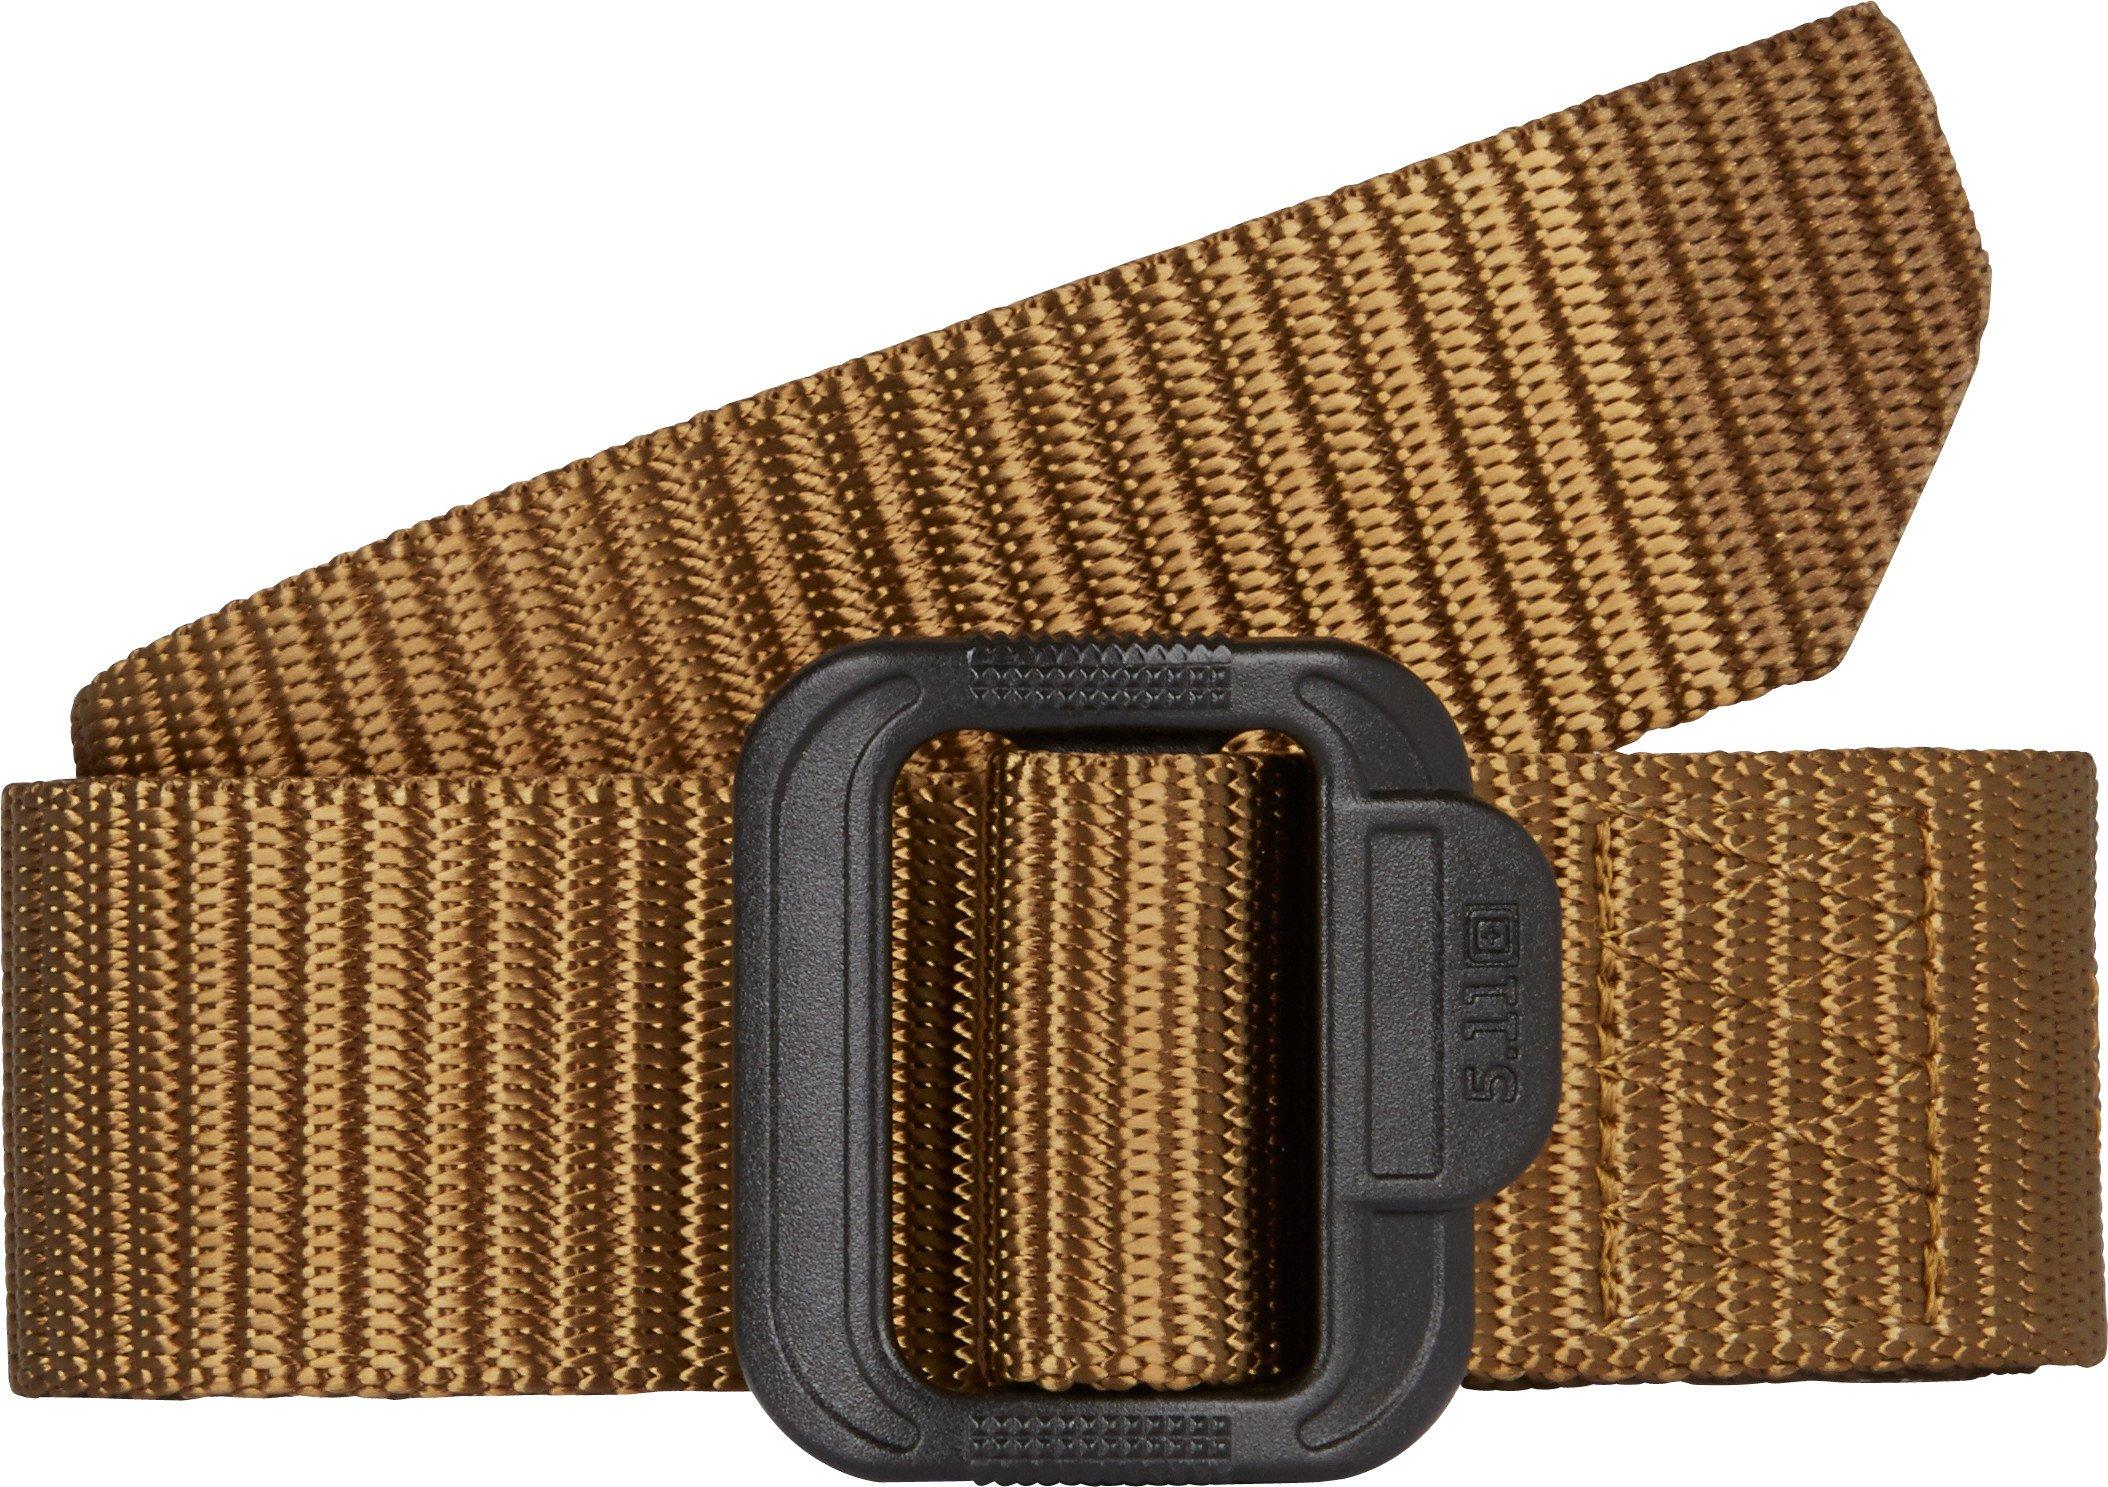 5.11 TDU 1.5-Inch Belt, Coyote Brown, XX-Large